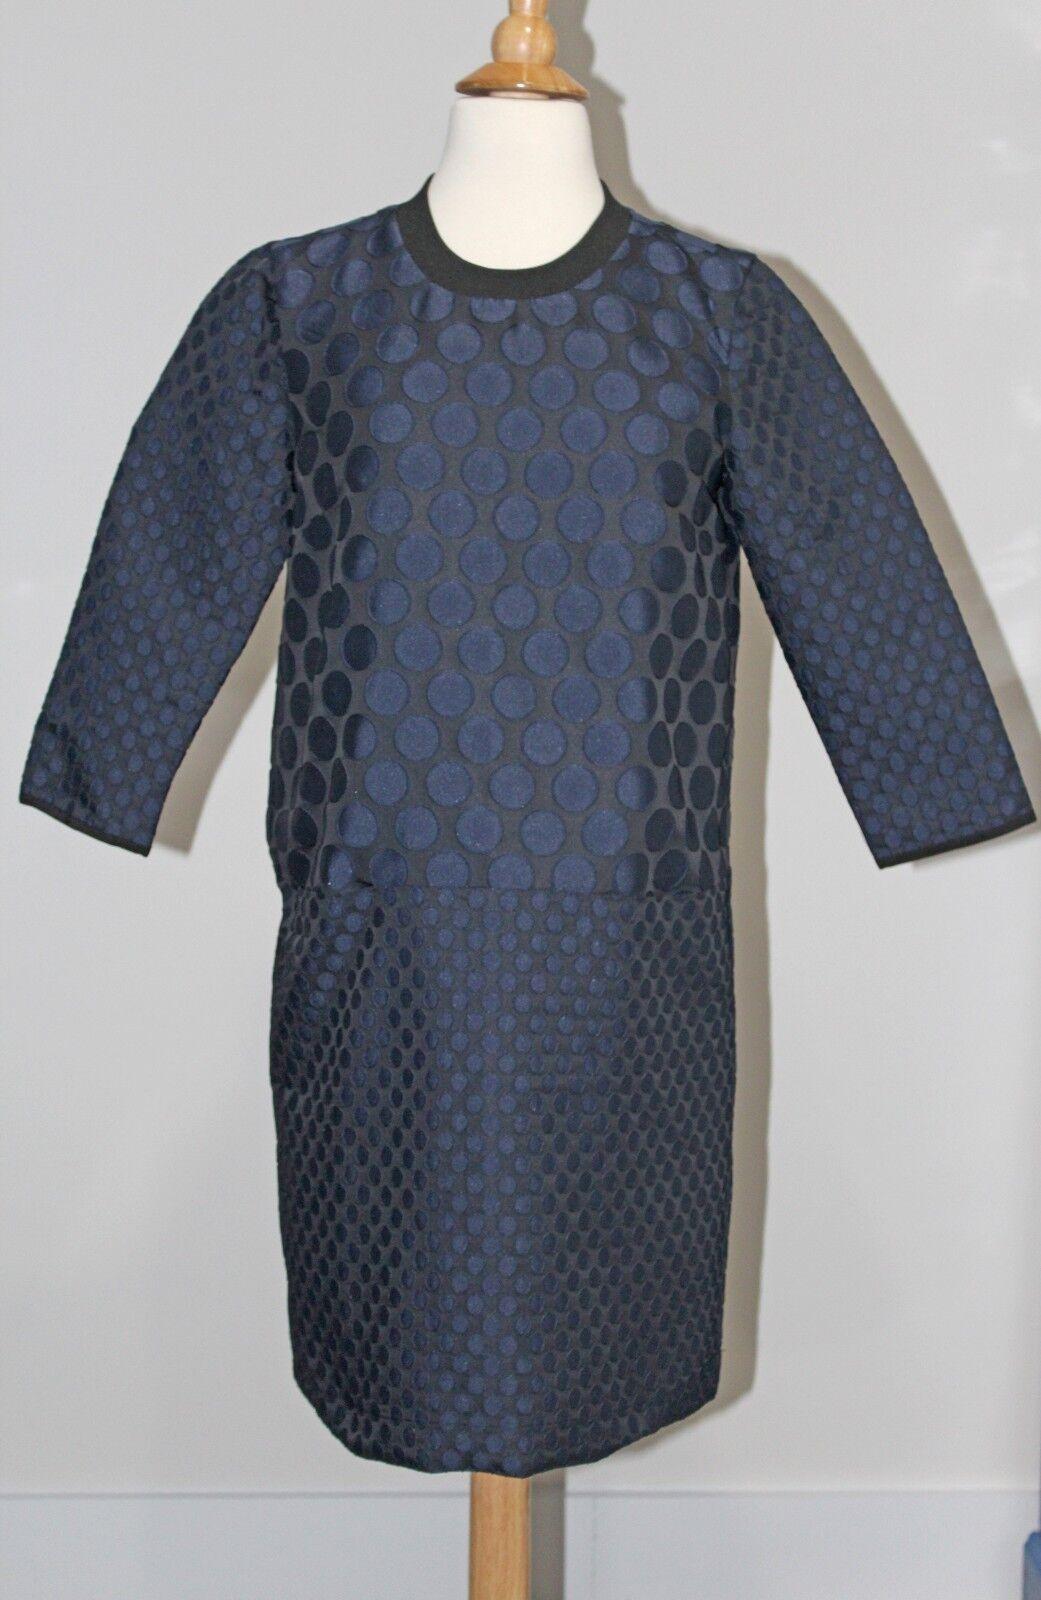 New MADEWELL Navy bluee MOOD DOT SHIFT DRESS Sz S 3 4 Length Sleeves